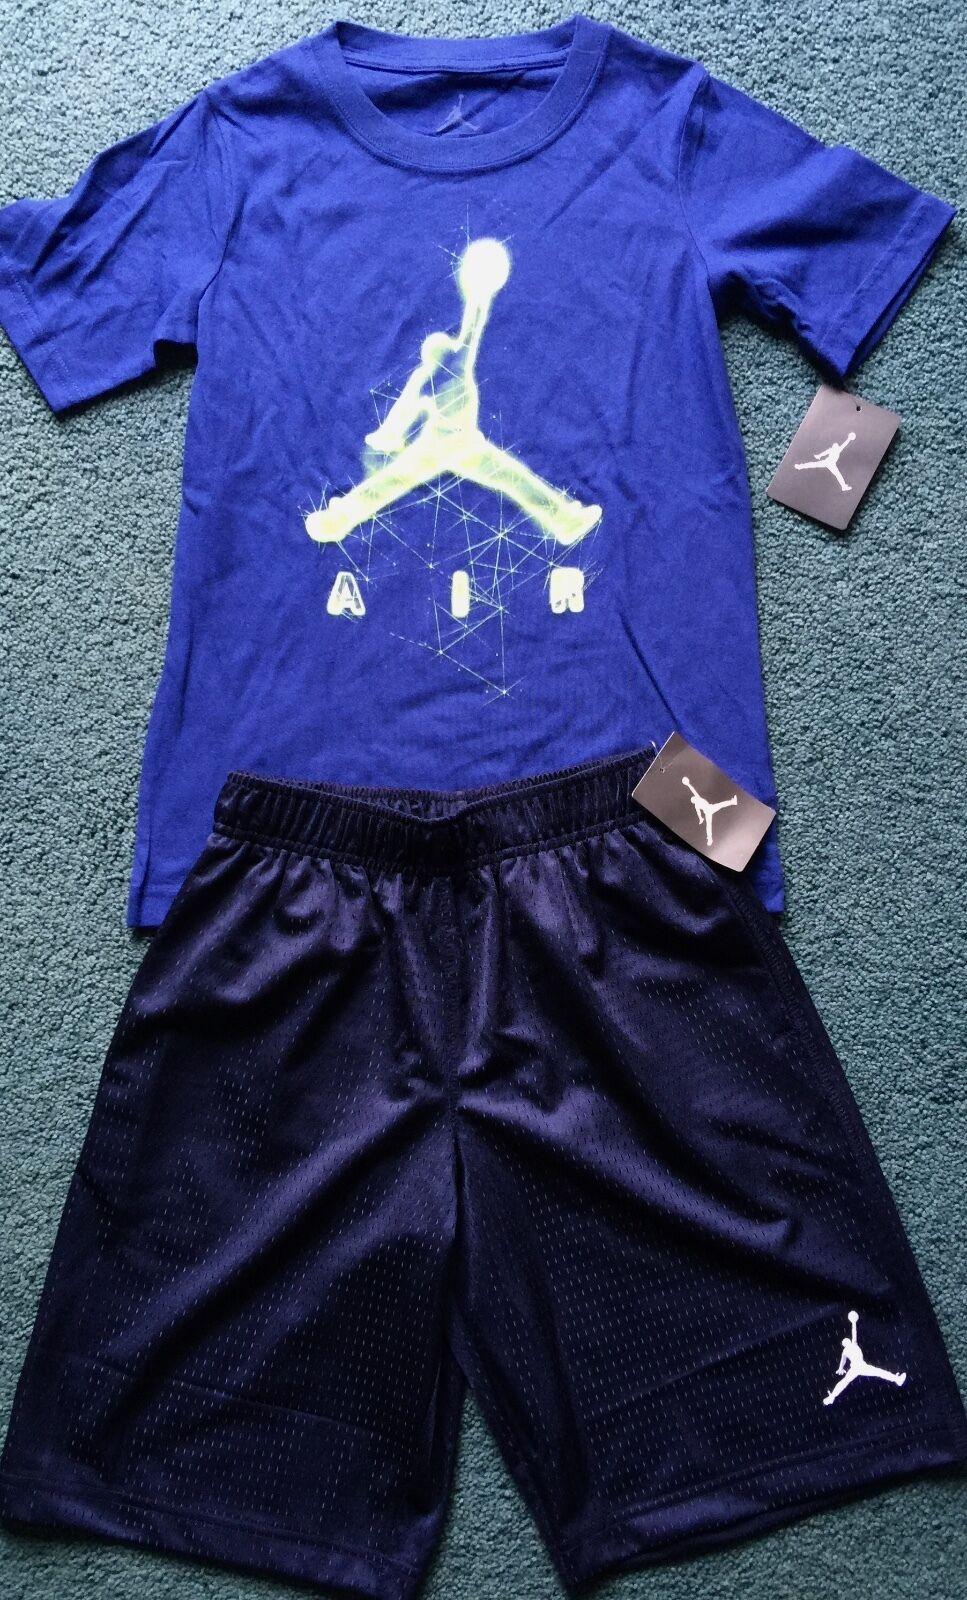 a6e7081a9b5 Buy Nike Jordan Boys YLG Dark Blue/neon Green/navy Blue Shorts Set ...